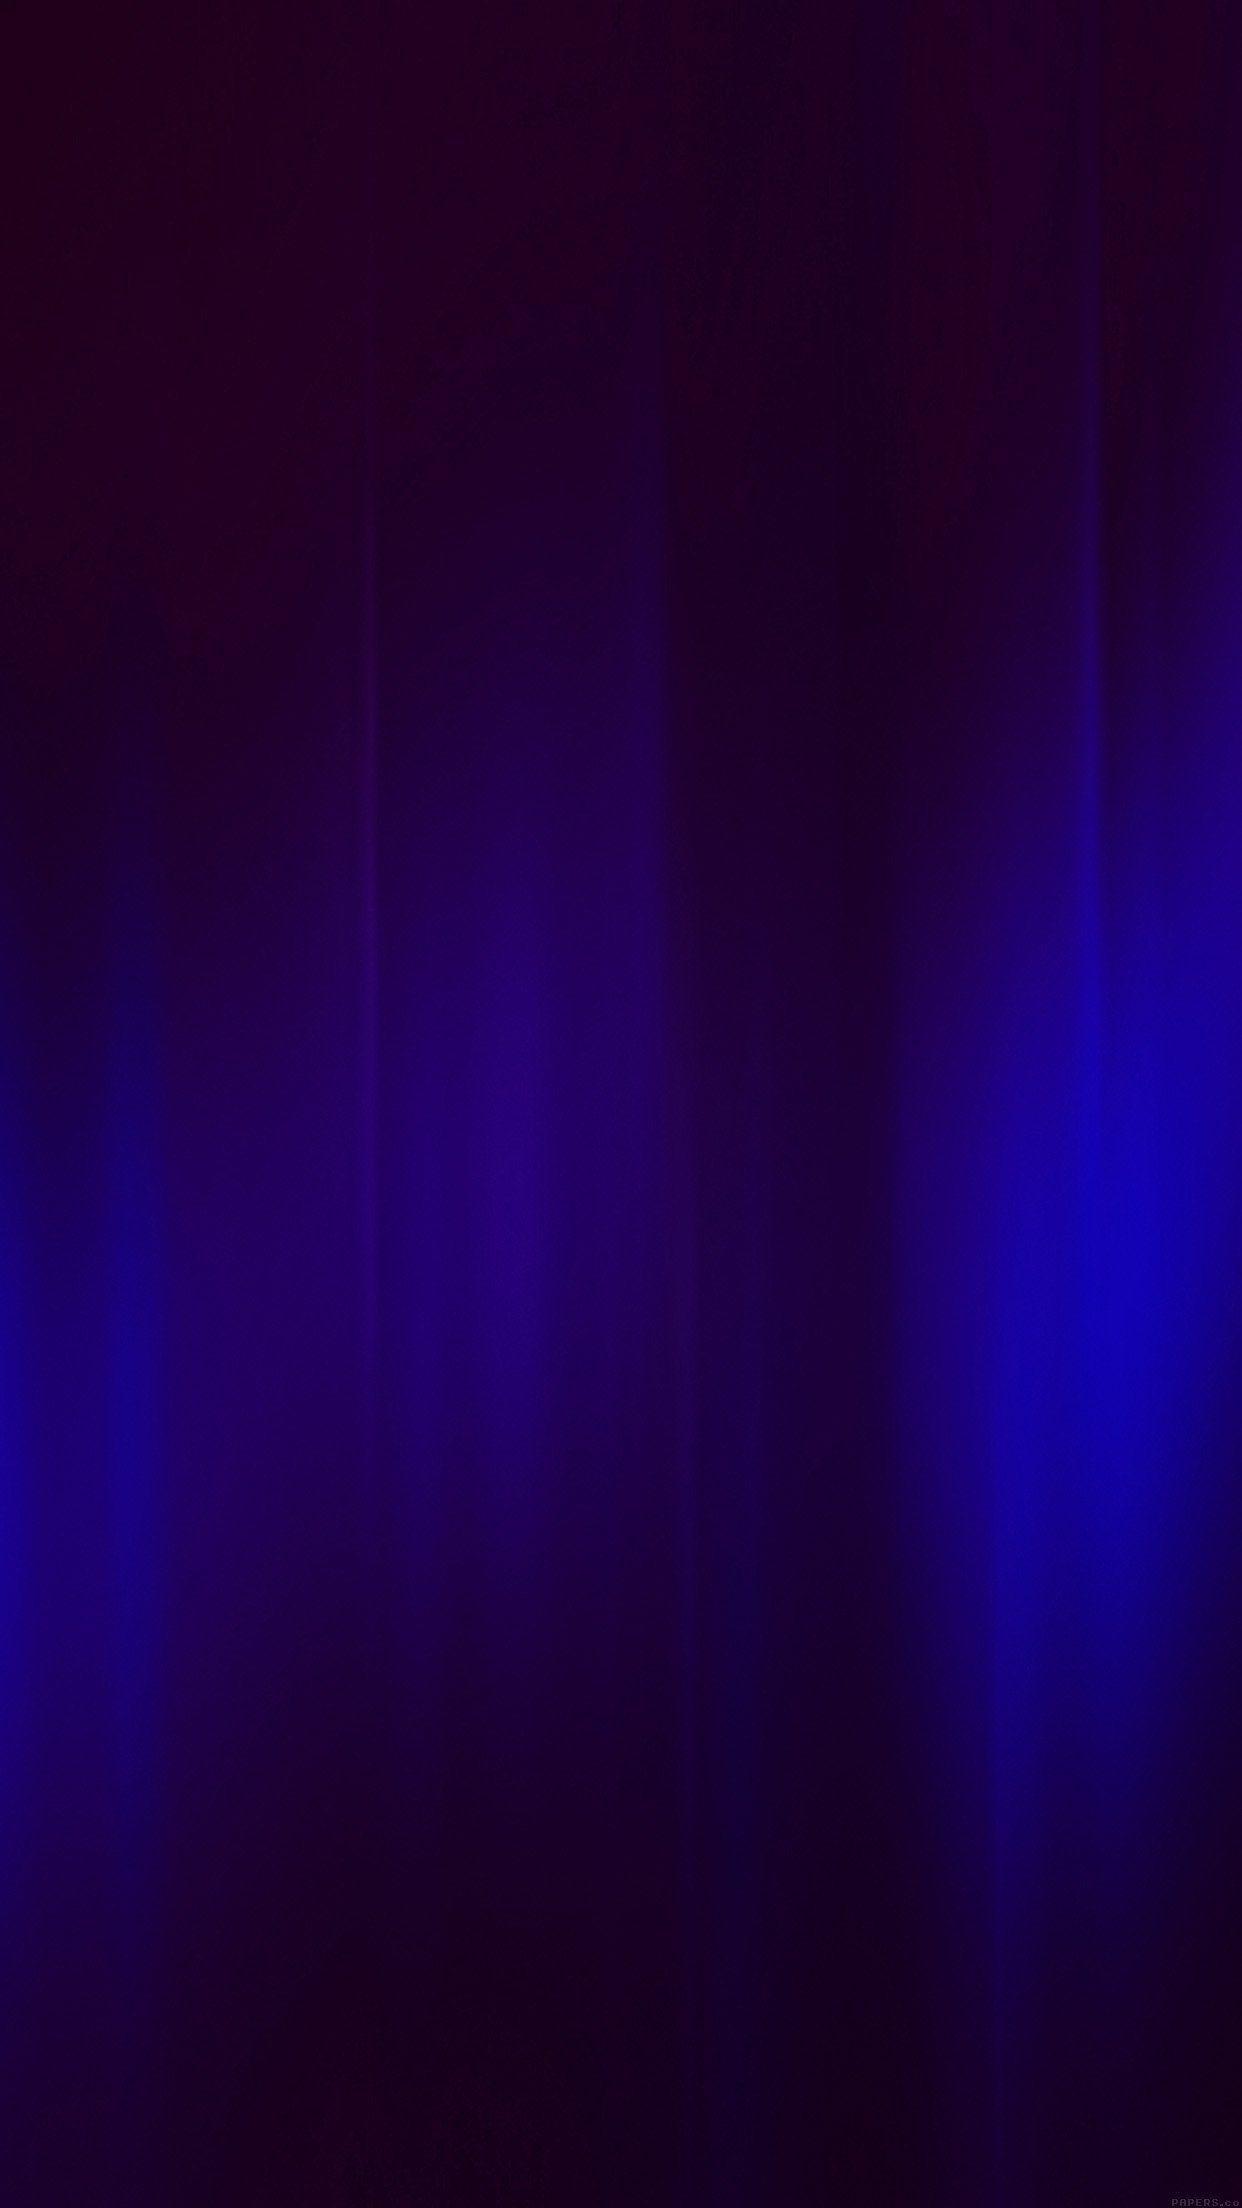 Wallpapers Dark Blue